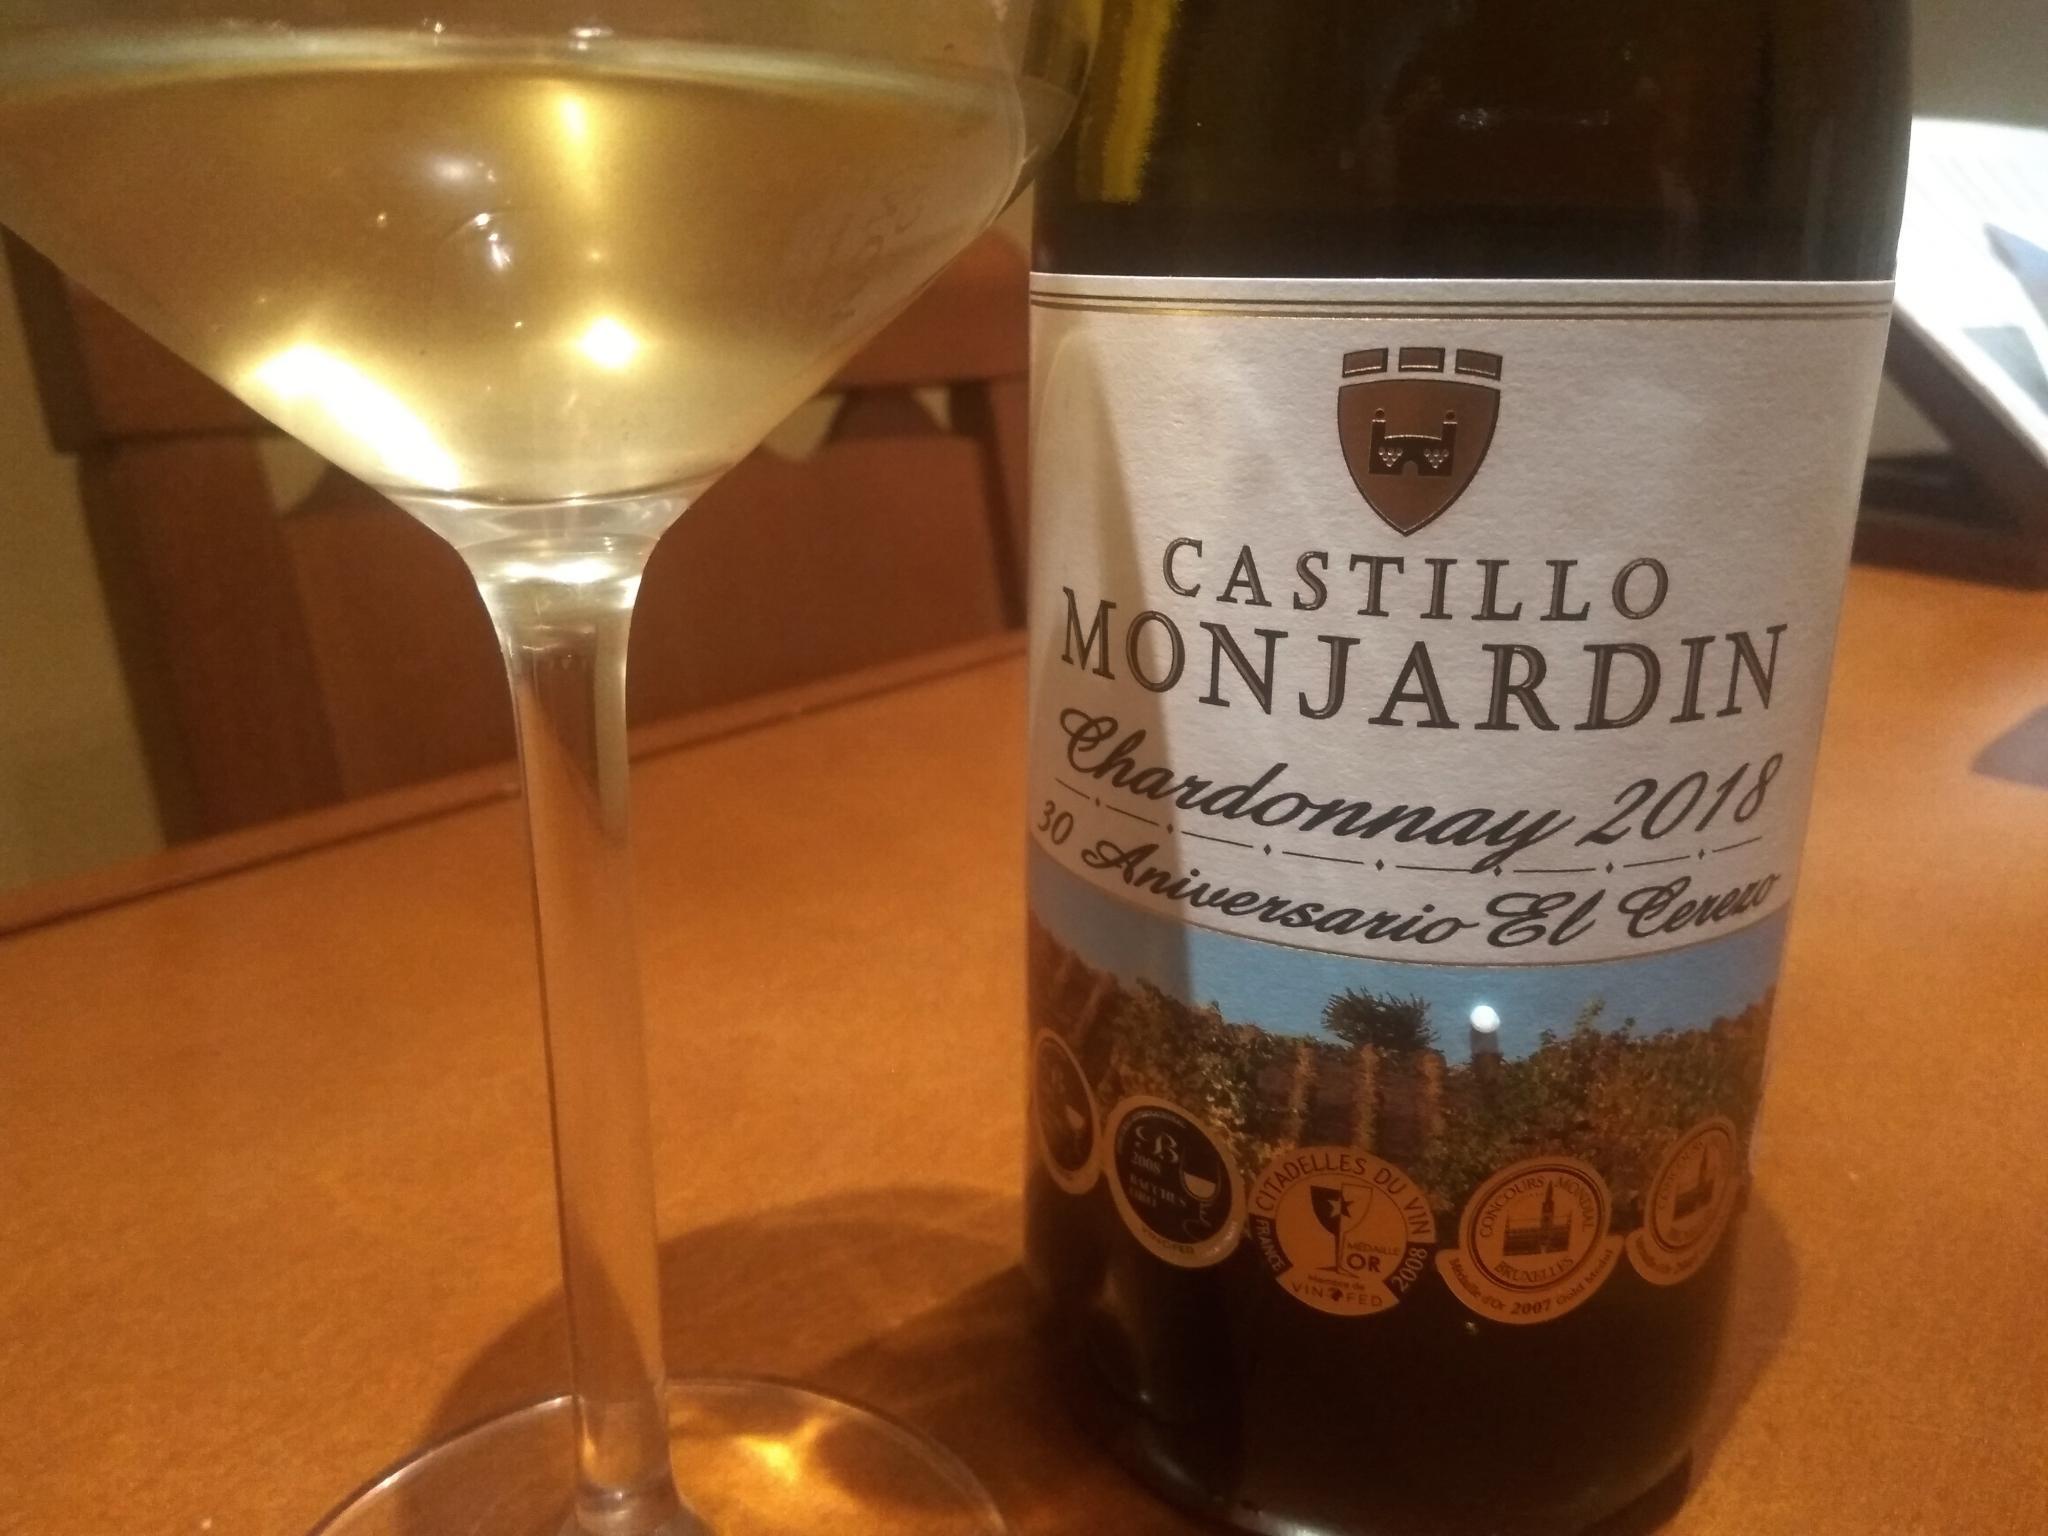 Castillo Monjardín Chardonnay 2018